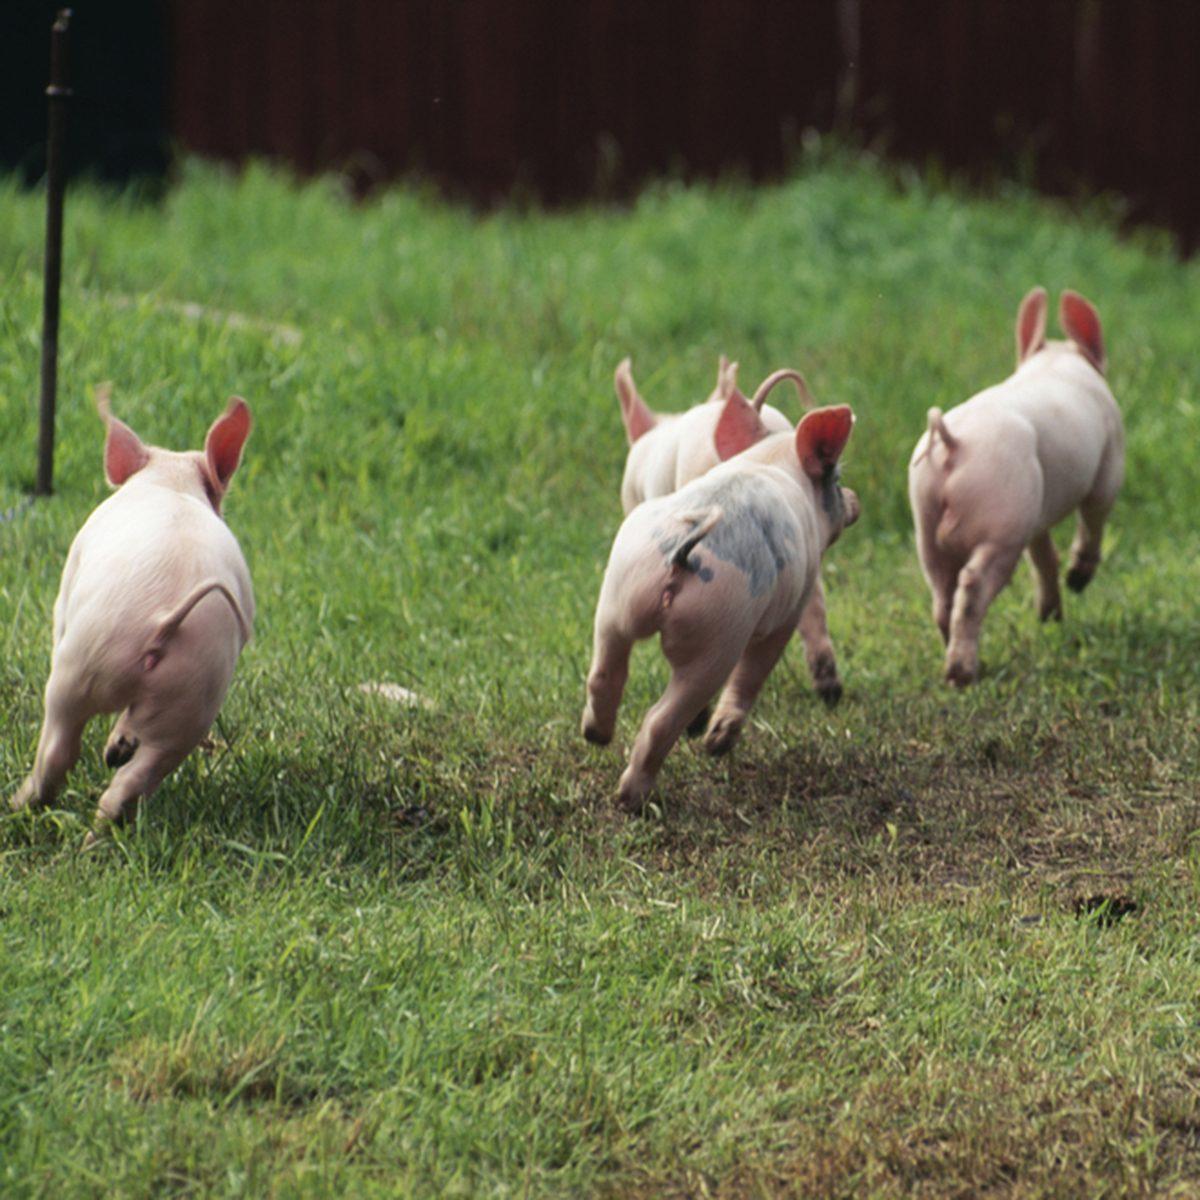 Piglets running in field